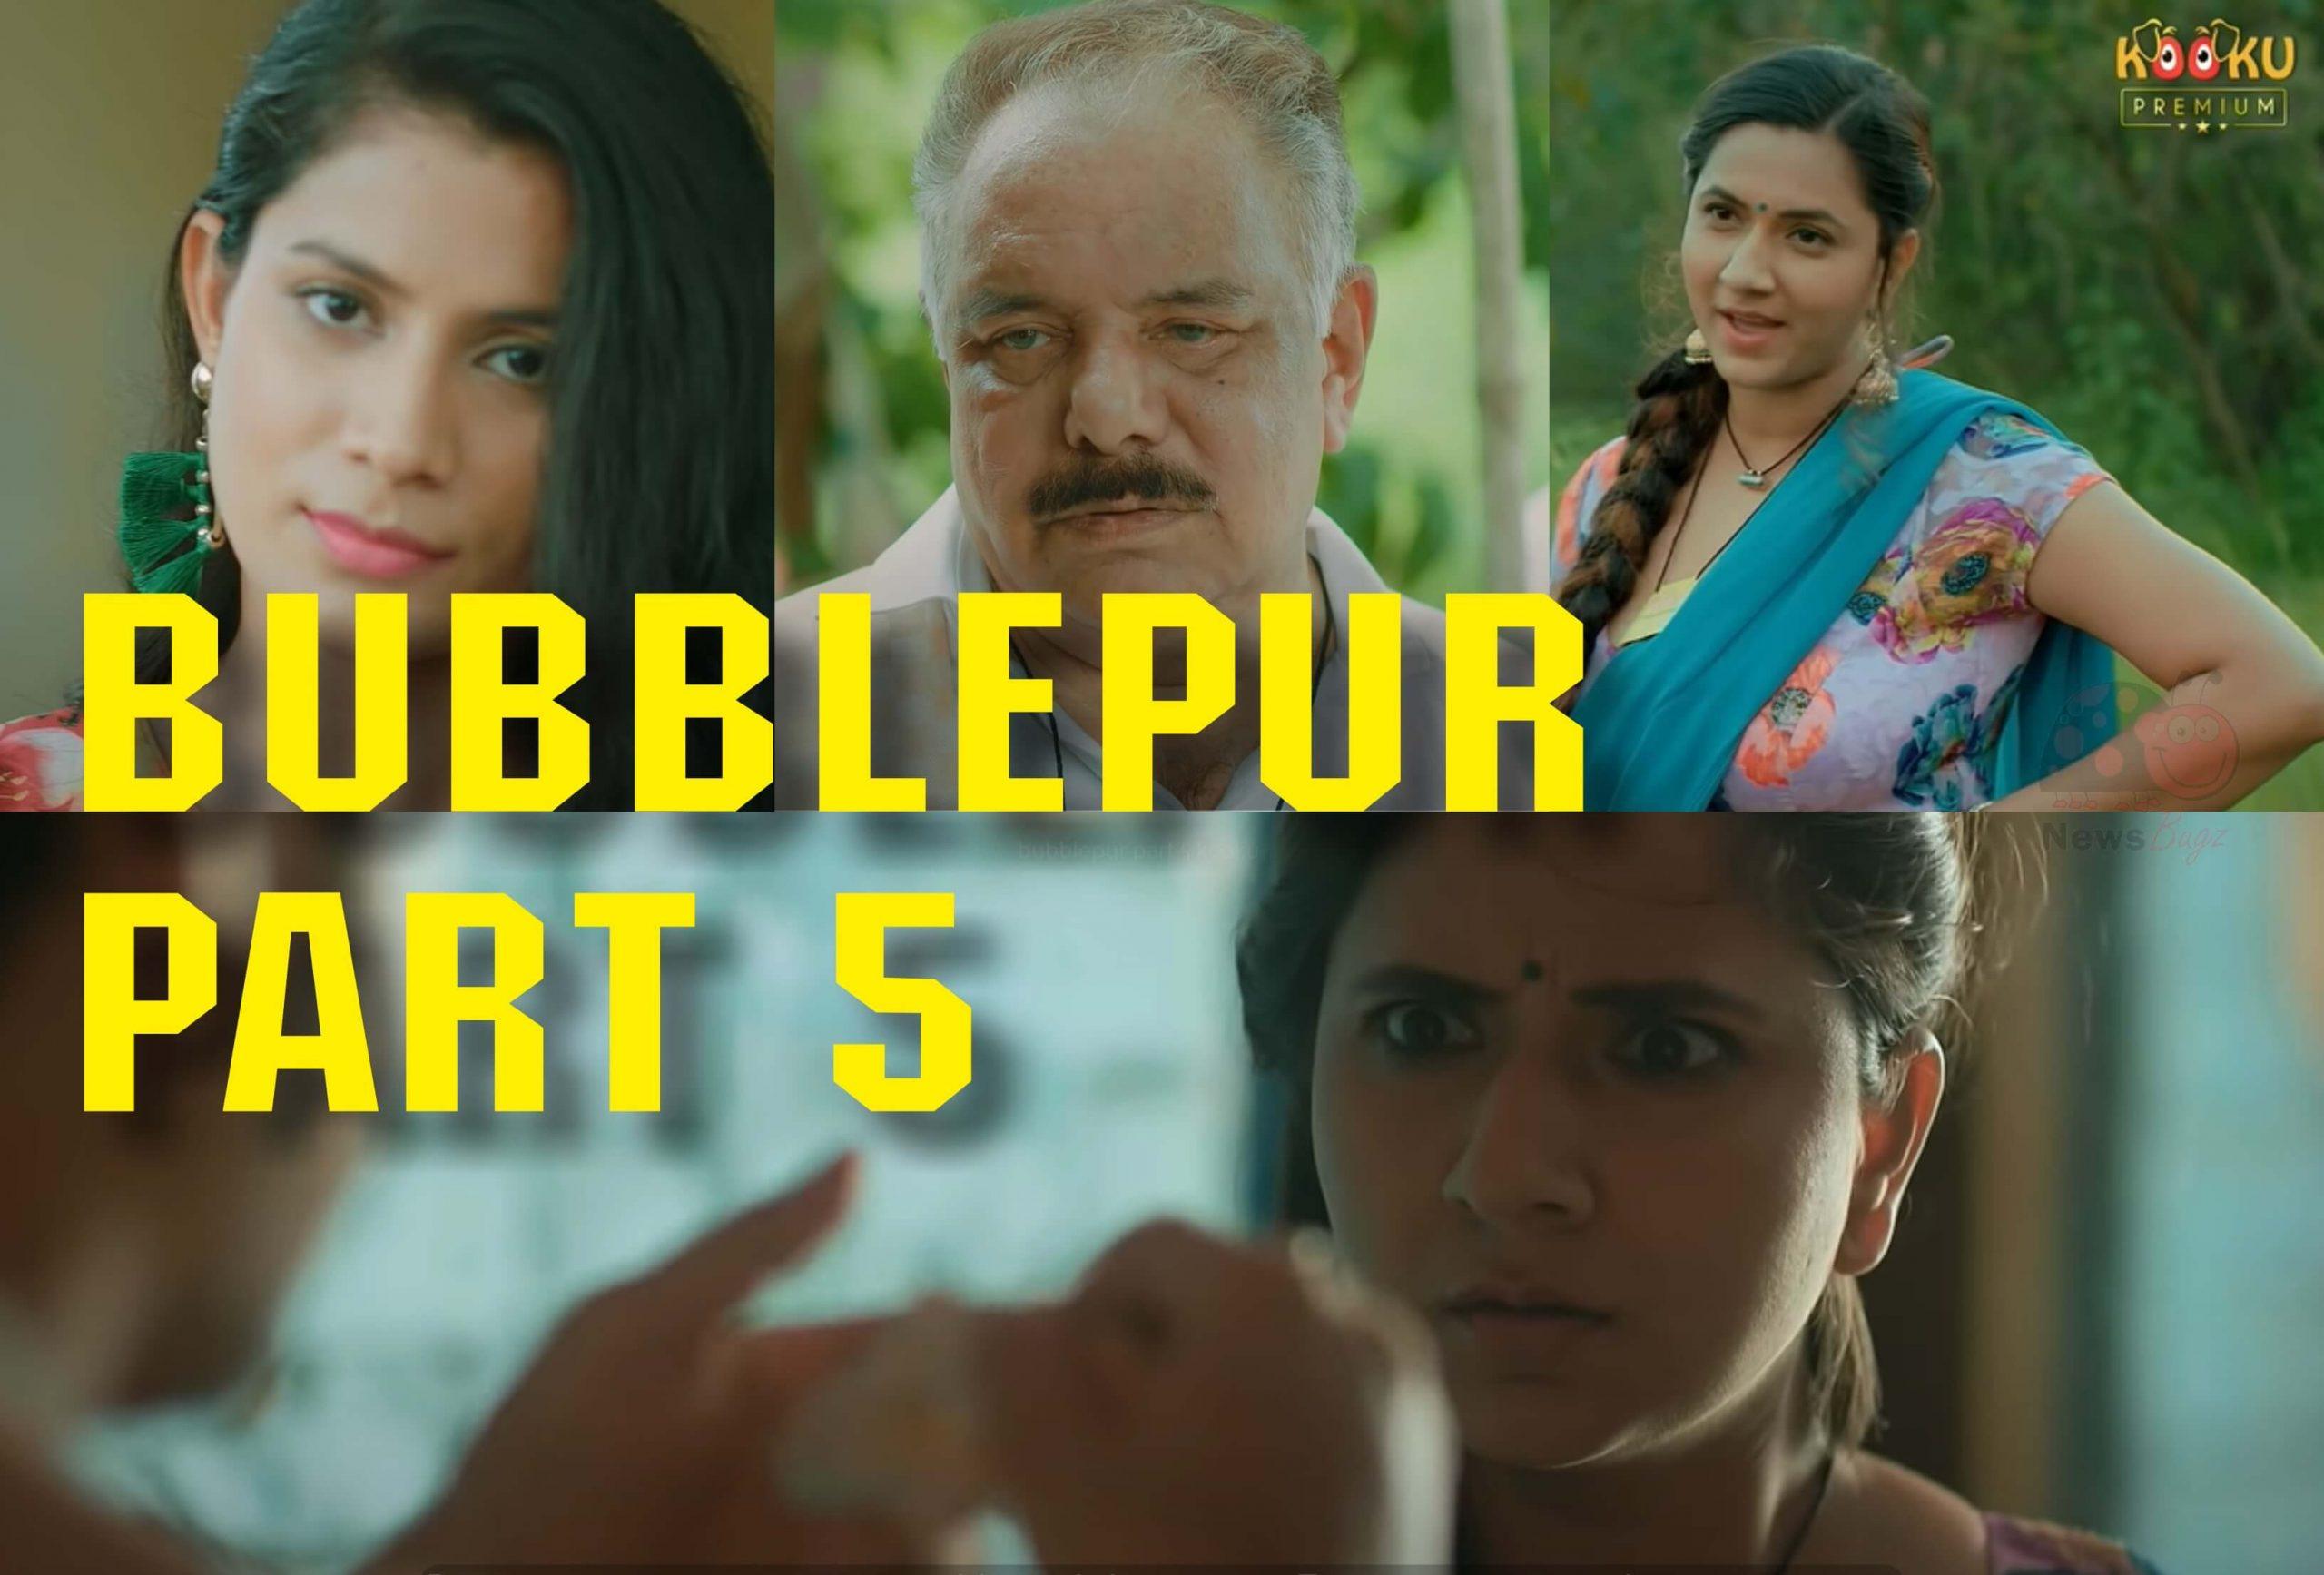 BubblePur Part 5 Webseries Kooku App All Episodes Watch Online